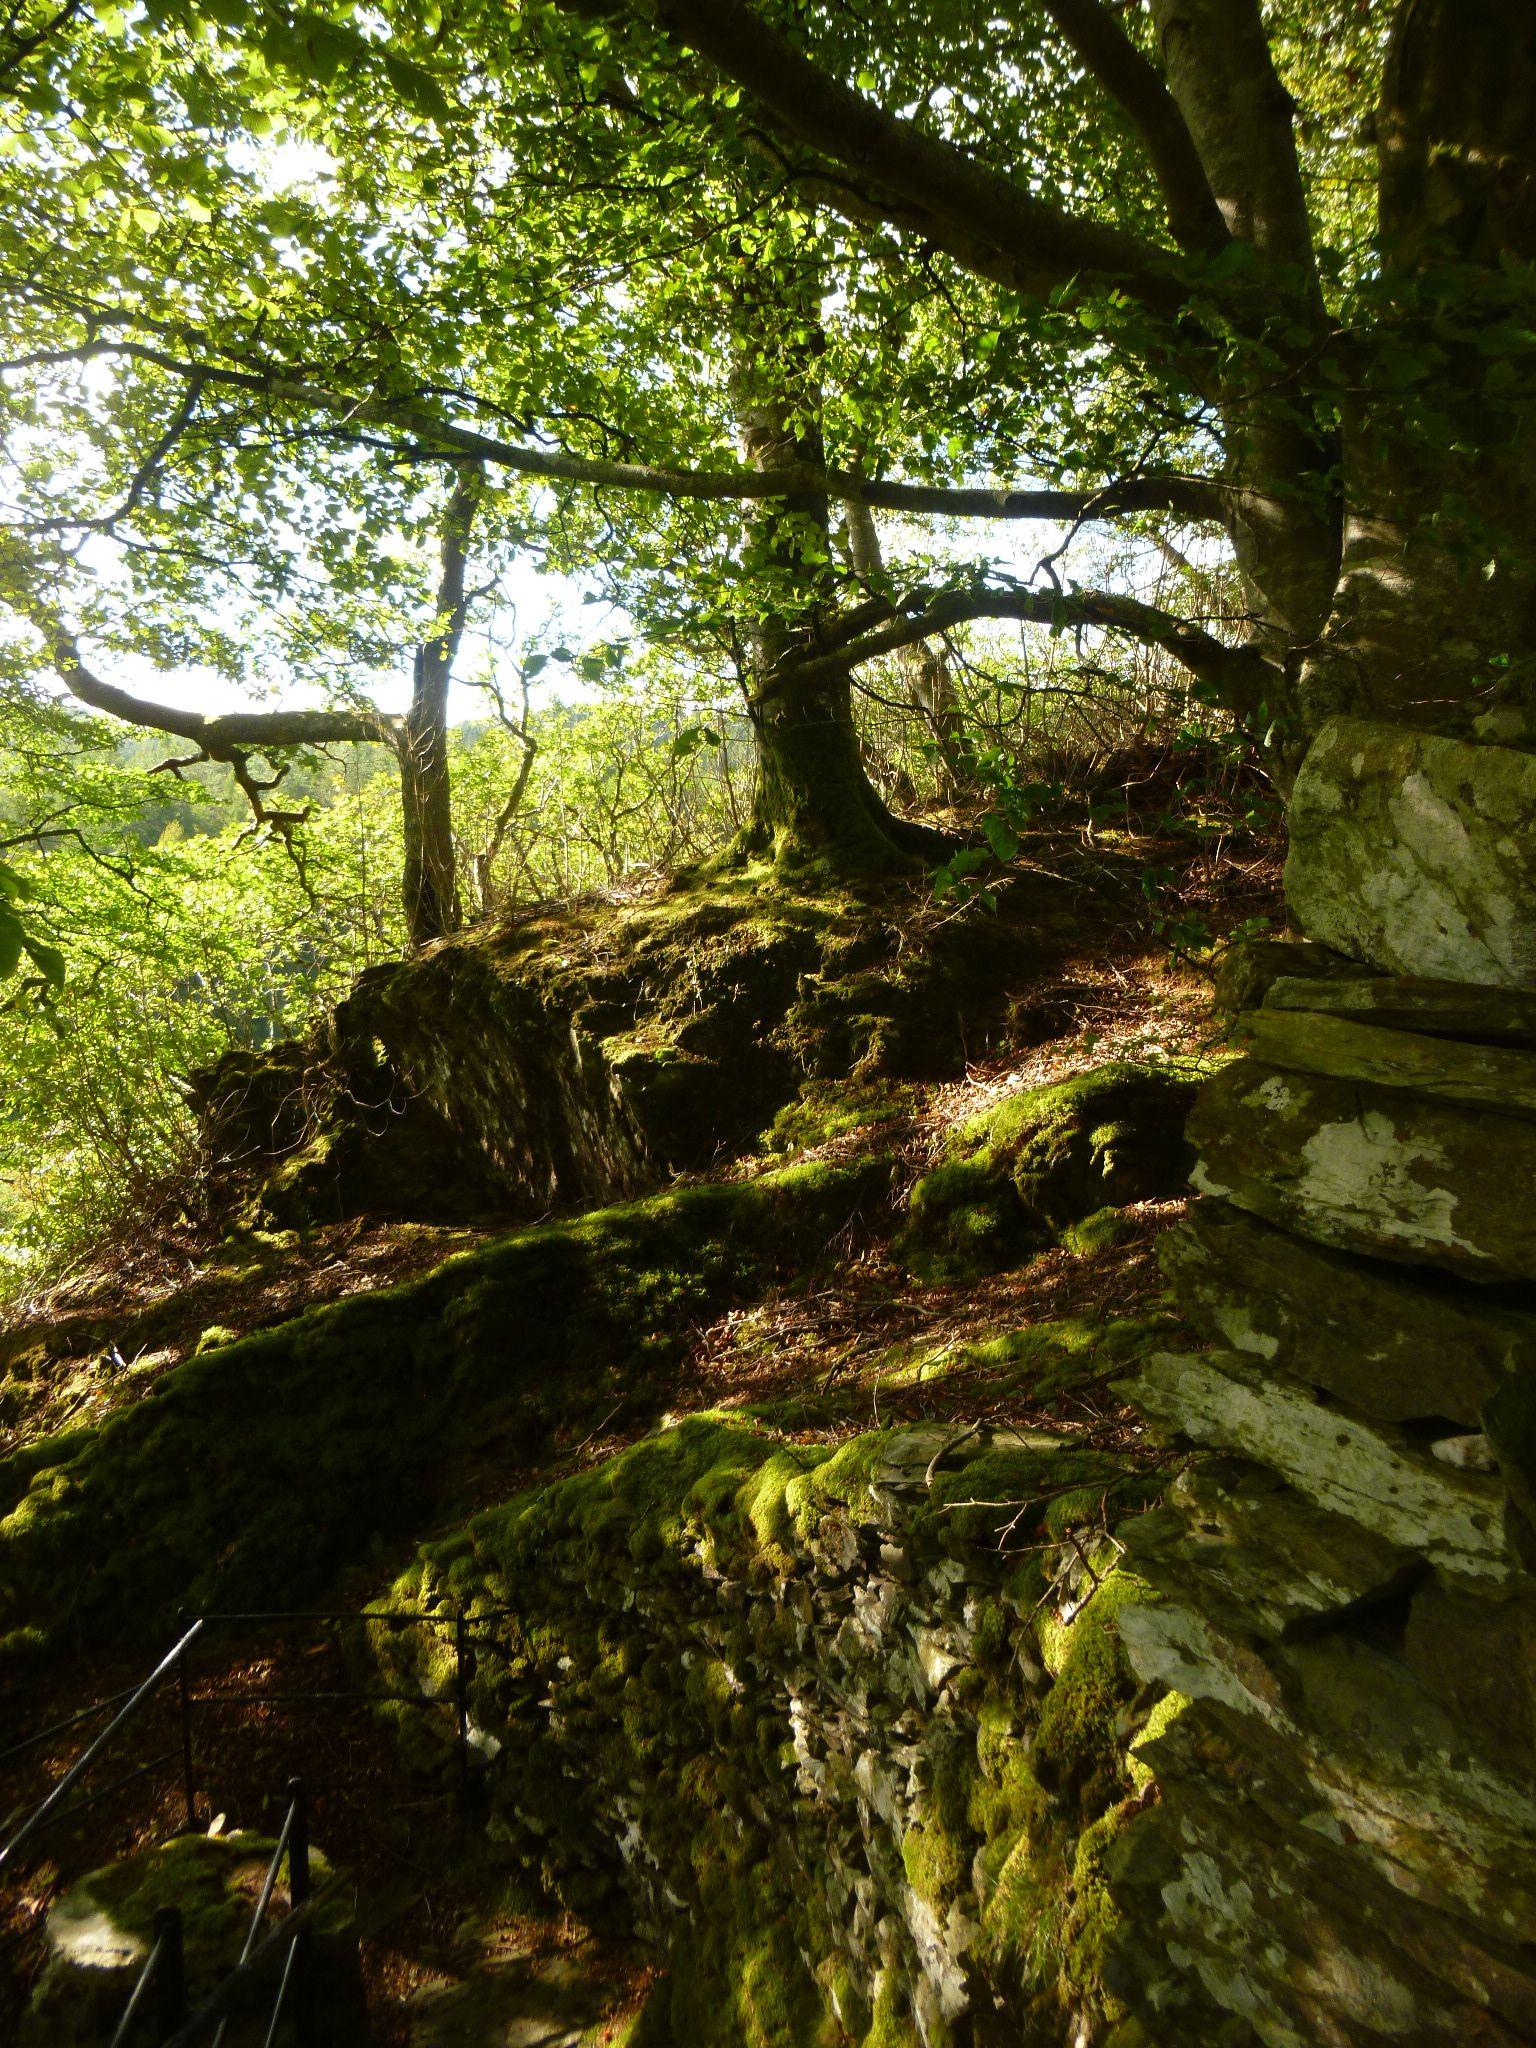 hafod, pont rhyd y groes , wales by chris.adams.3557